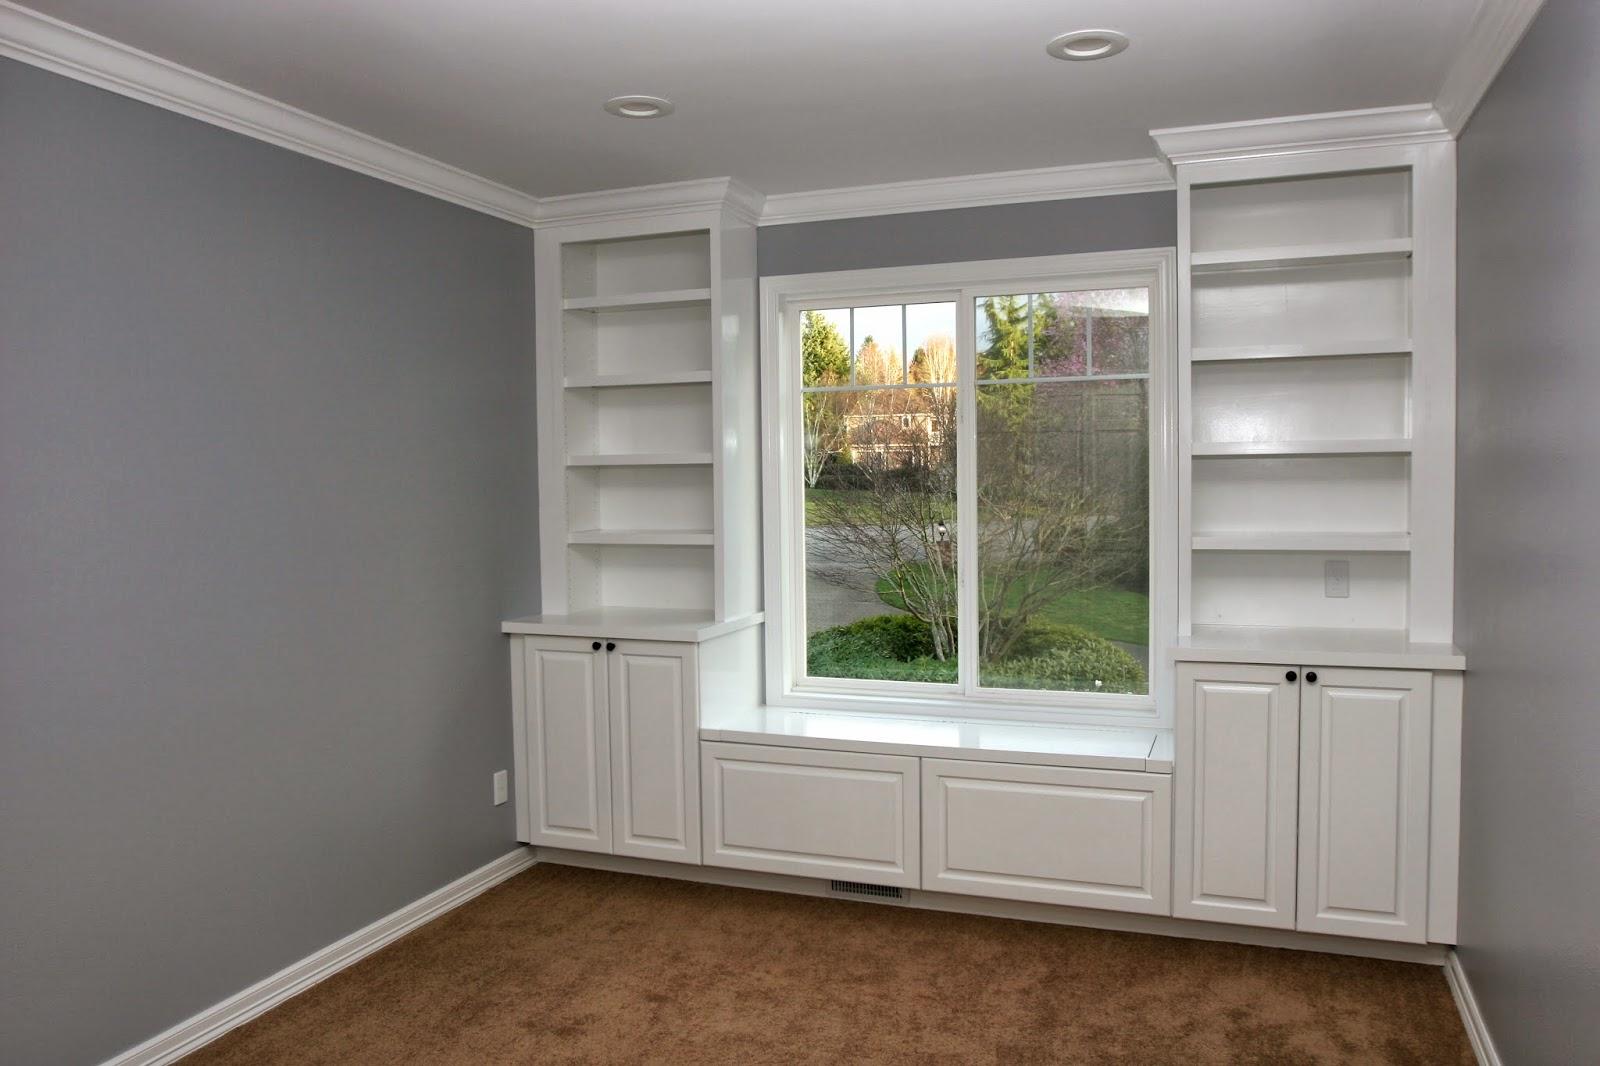 Trim cabinets doors crown super white pm 1